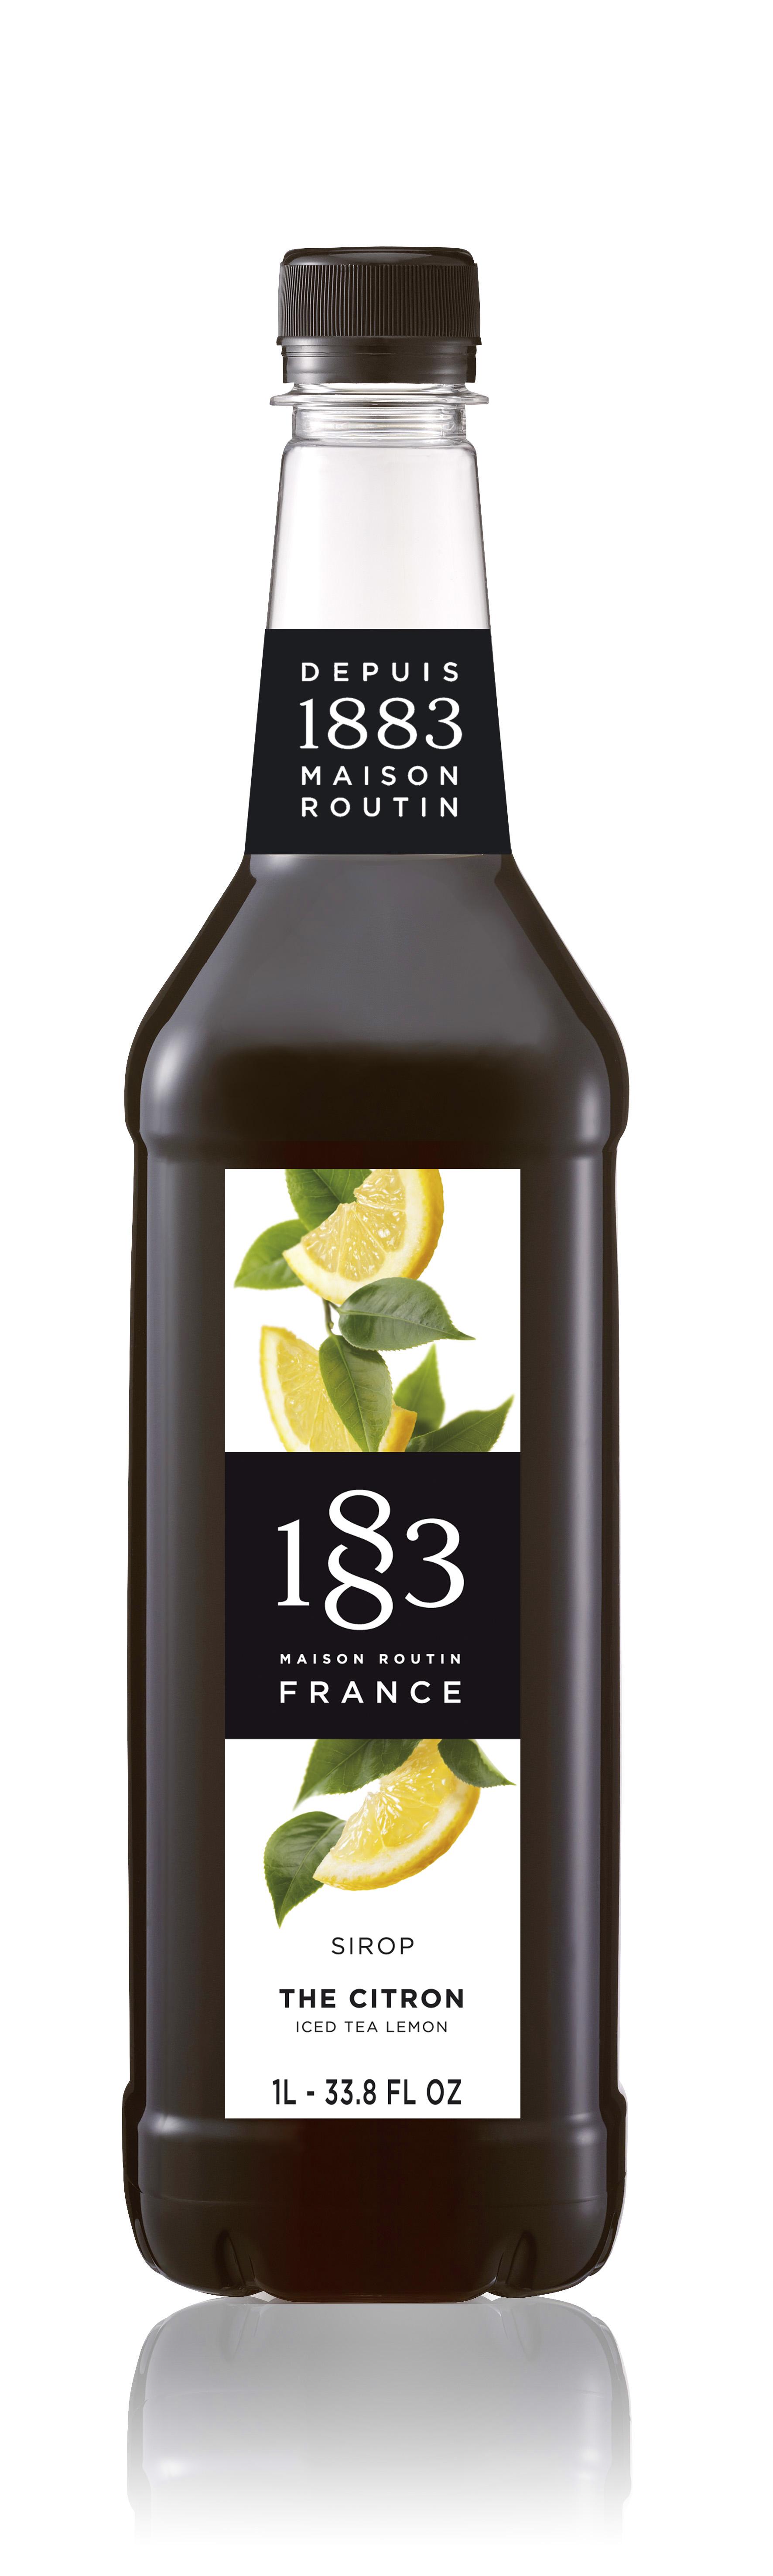 1883 Syrup Iced Tea Lemon  1L PET Plastic Bottle